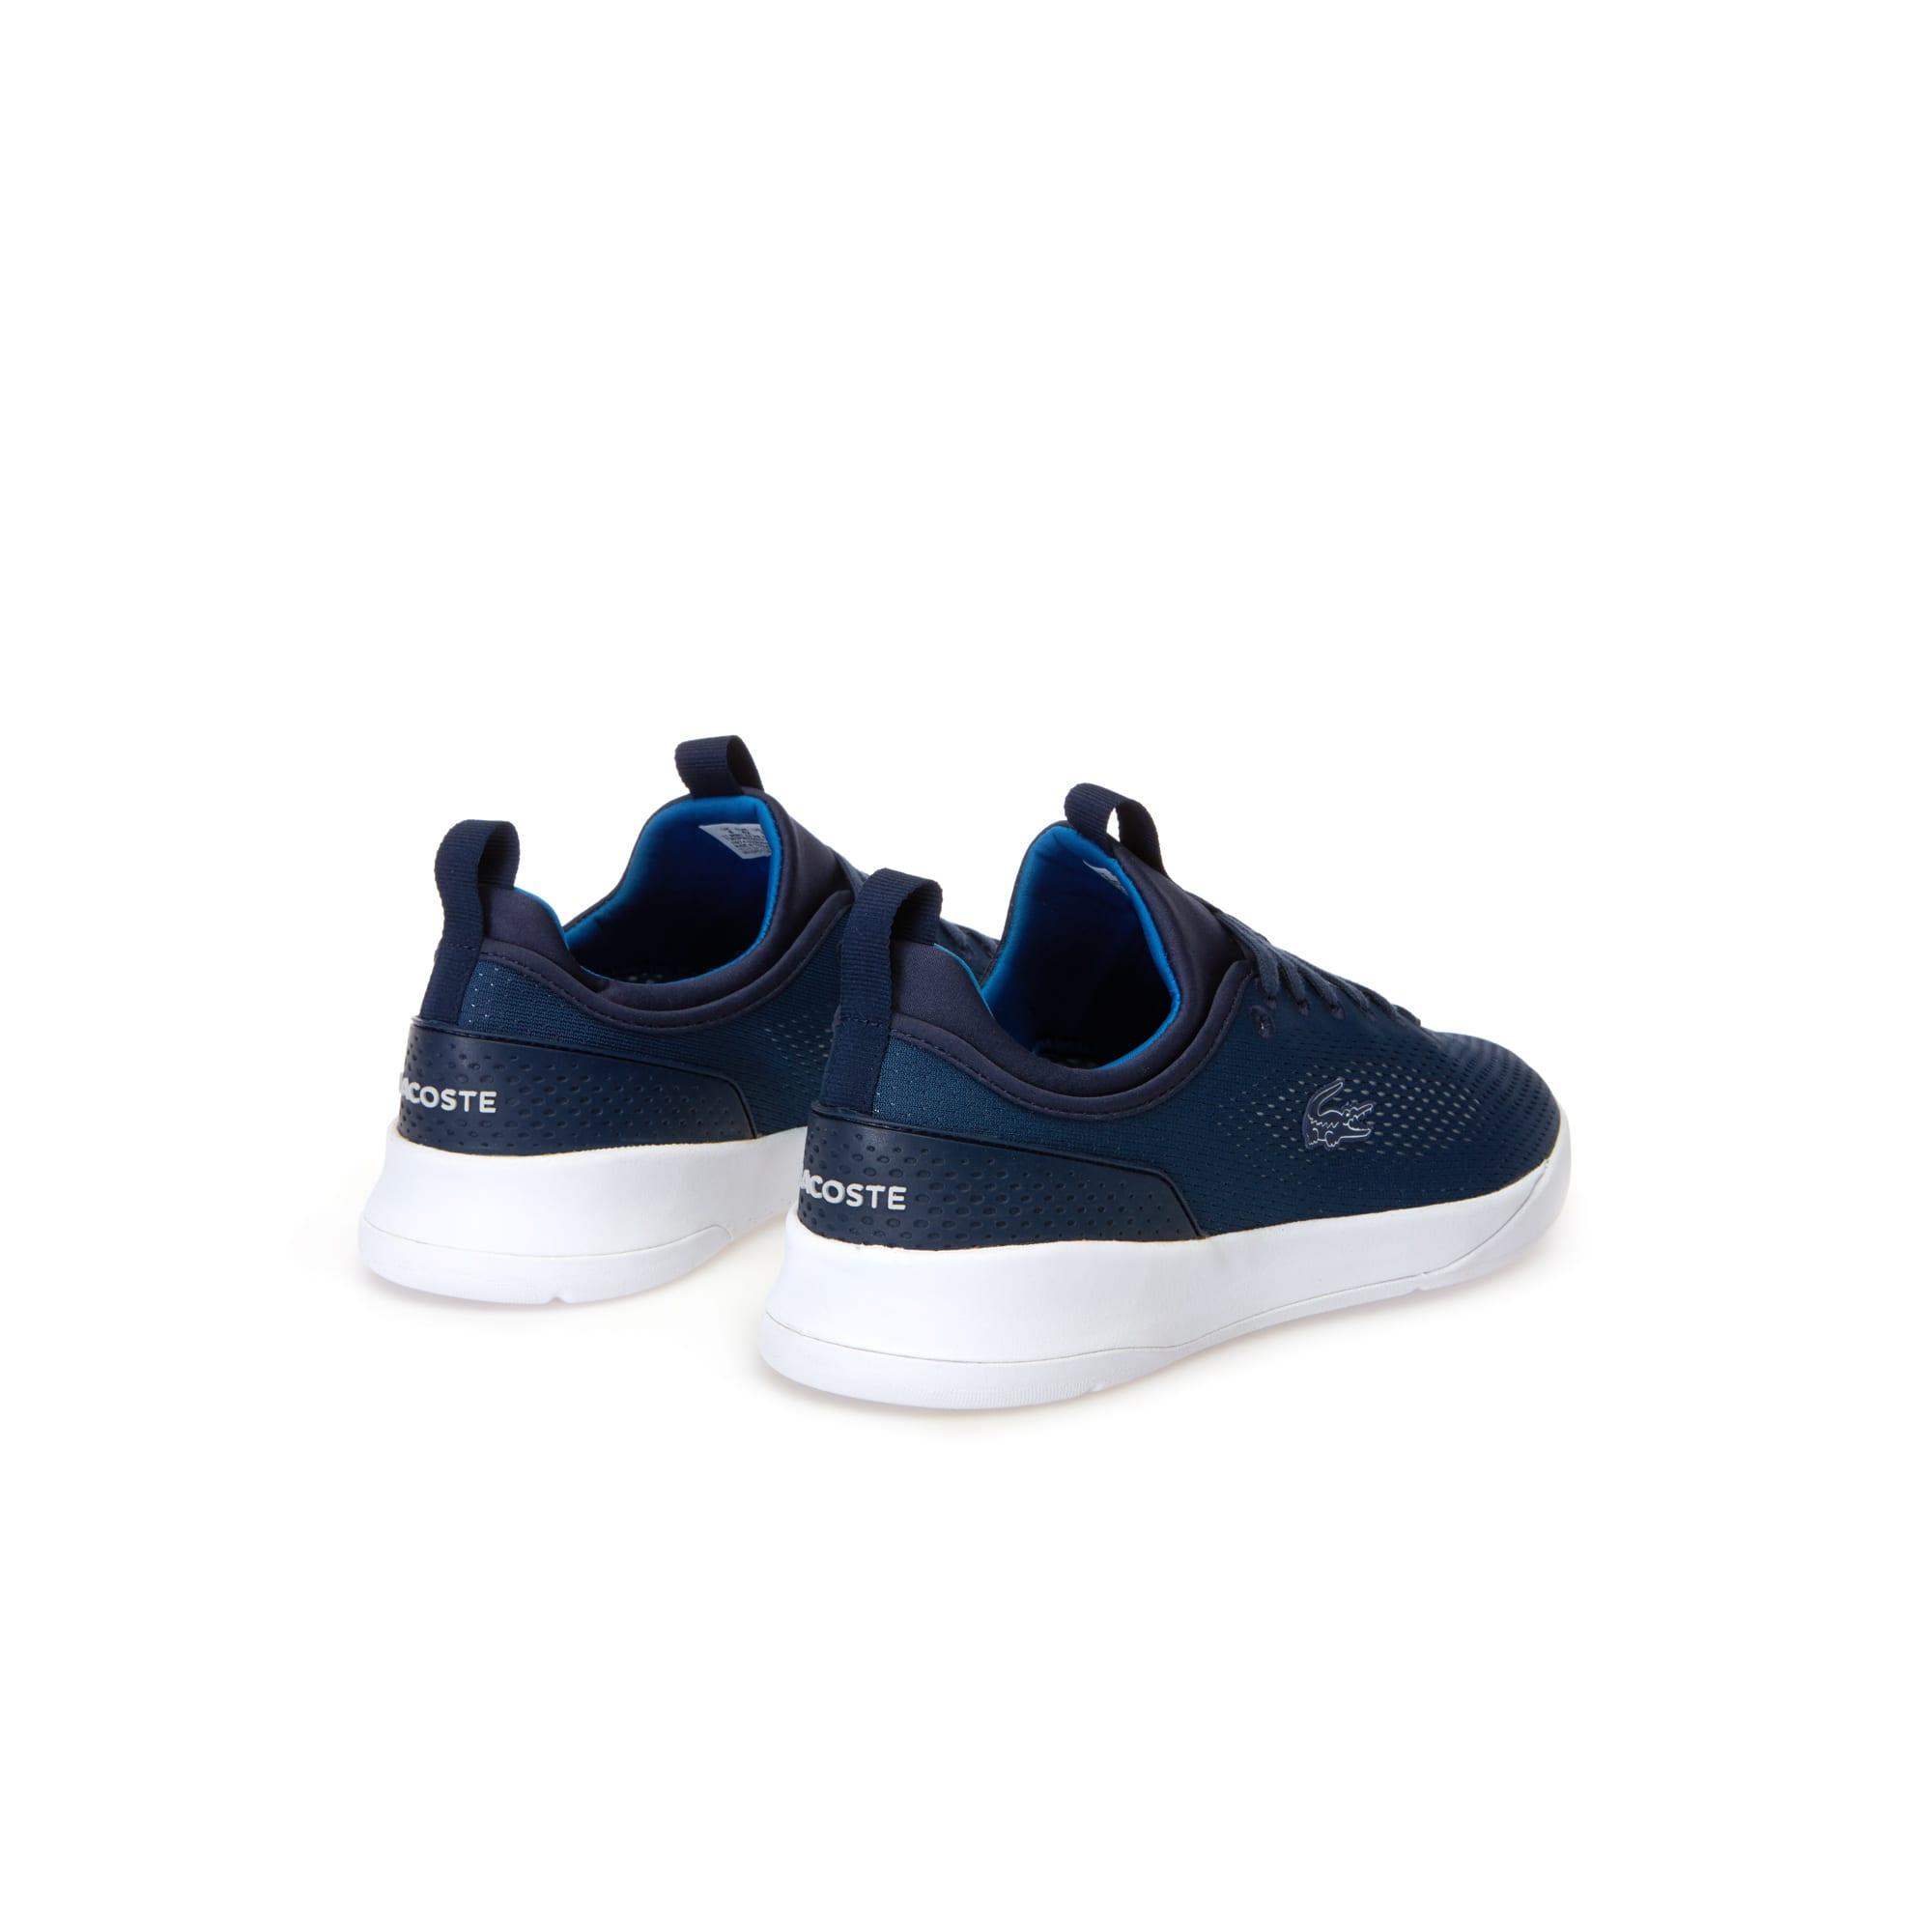 Lacoste - Zapatillas de hombre LT Spirit SPORT 2.0 de malla - 3